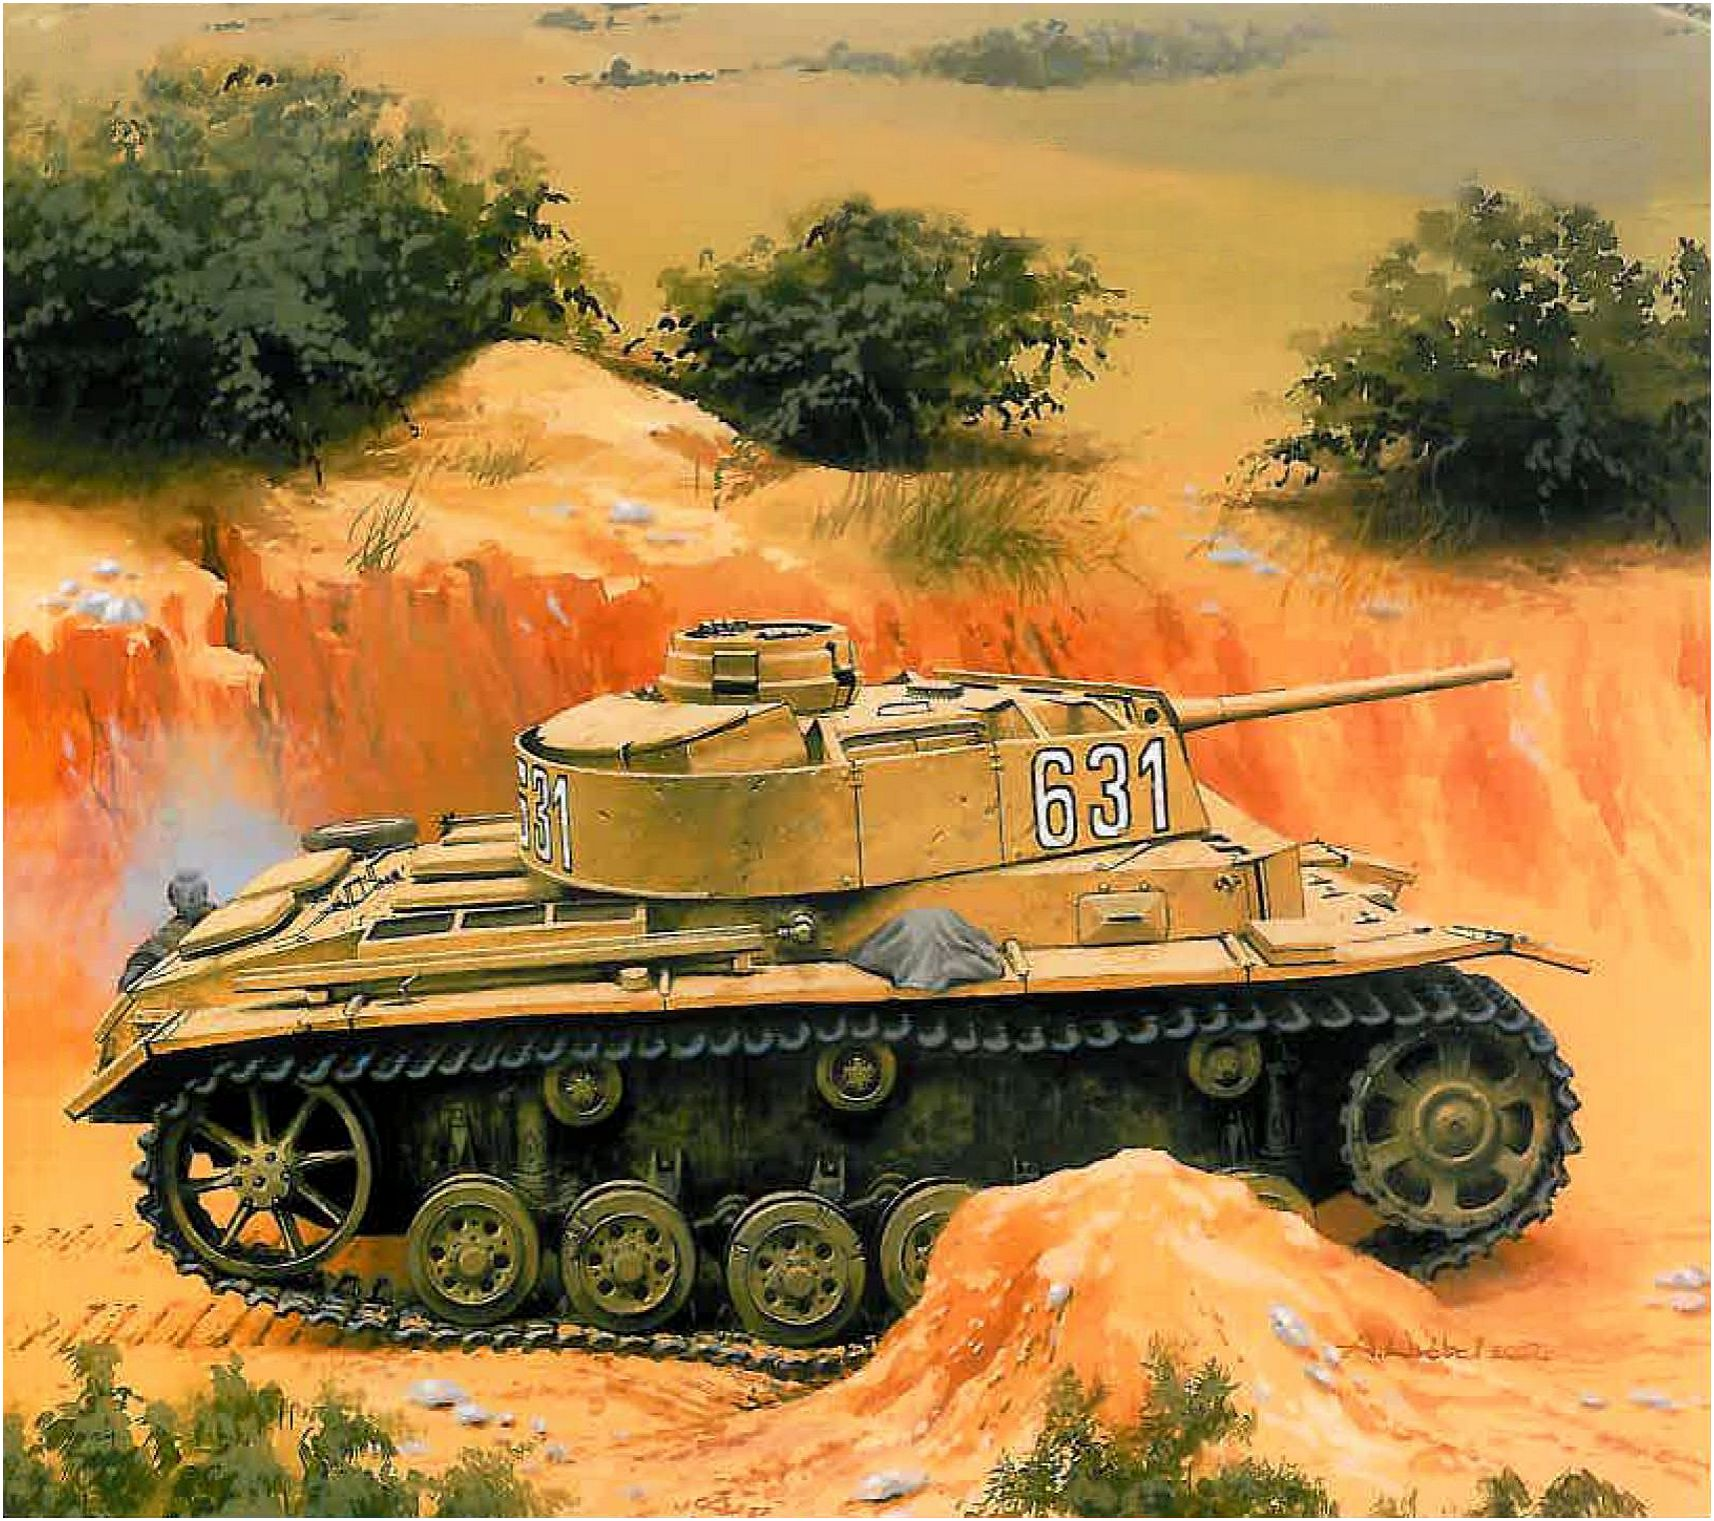 Wróbel Arkadiusz. Танк PzKpfw III.